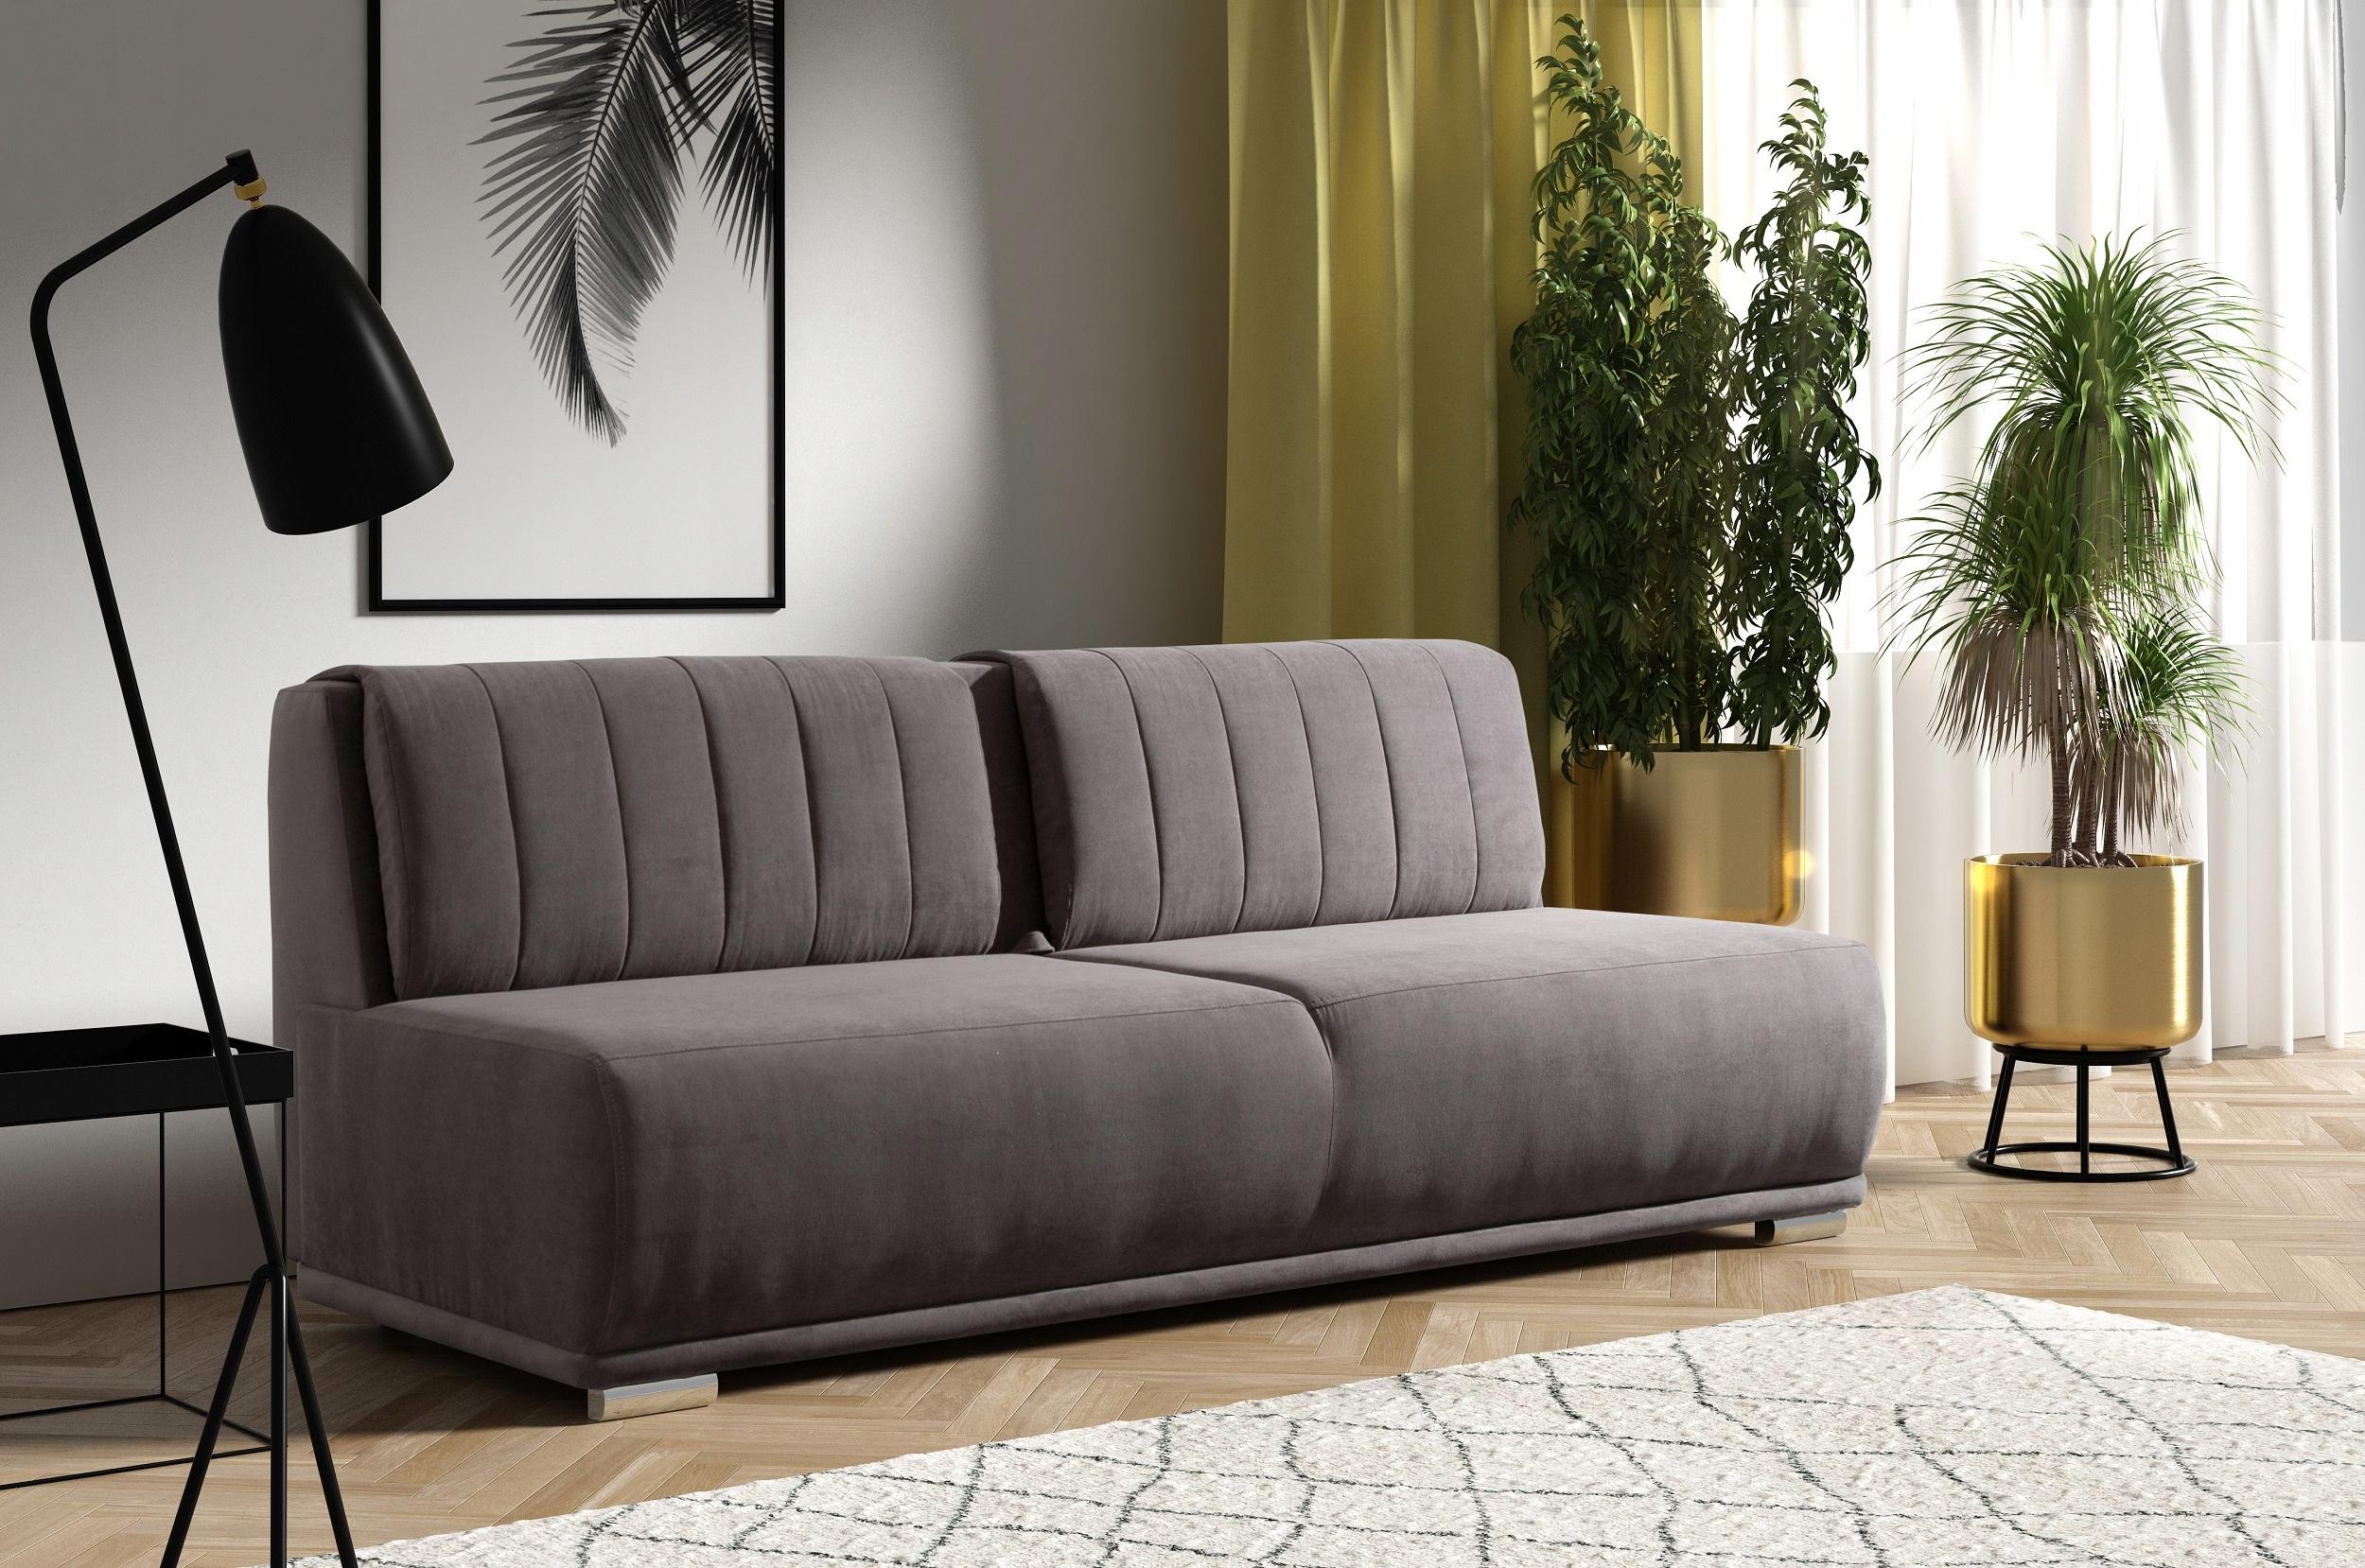 MERINDA Avantgarde-Sofa - Sofamaschine DL